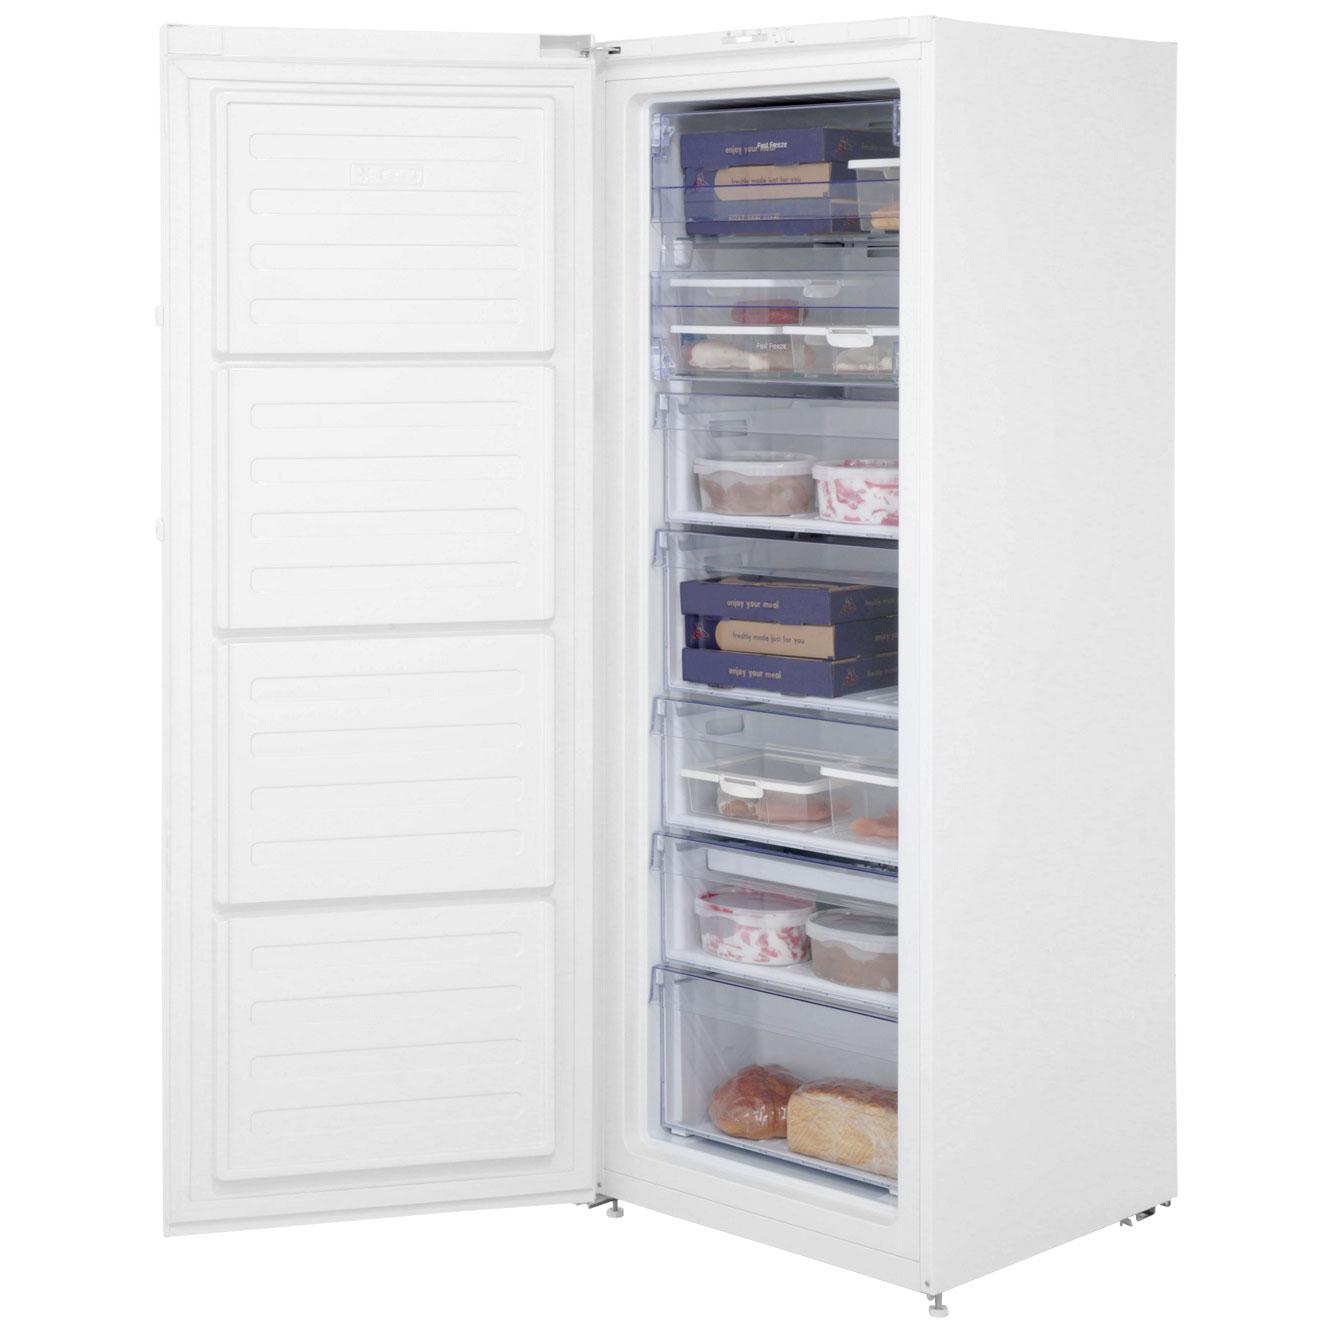 Beko Ffp1671w Upright Freezer White